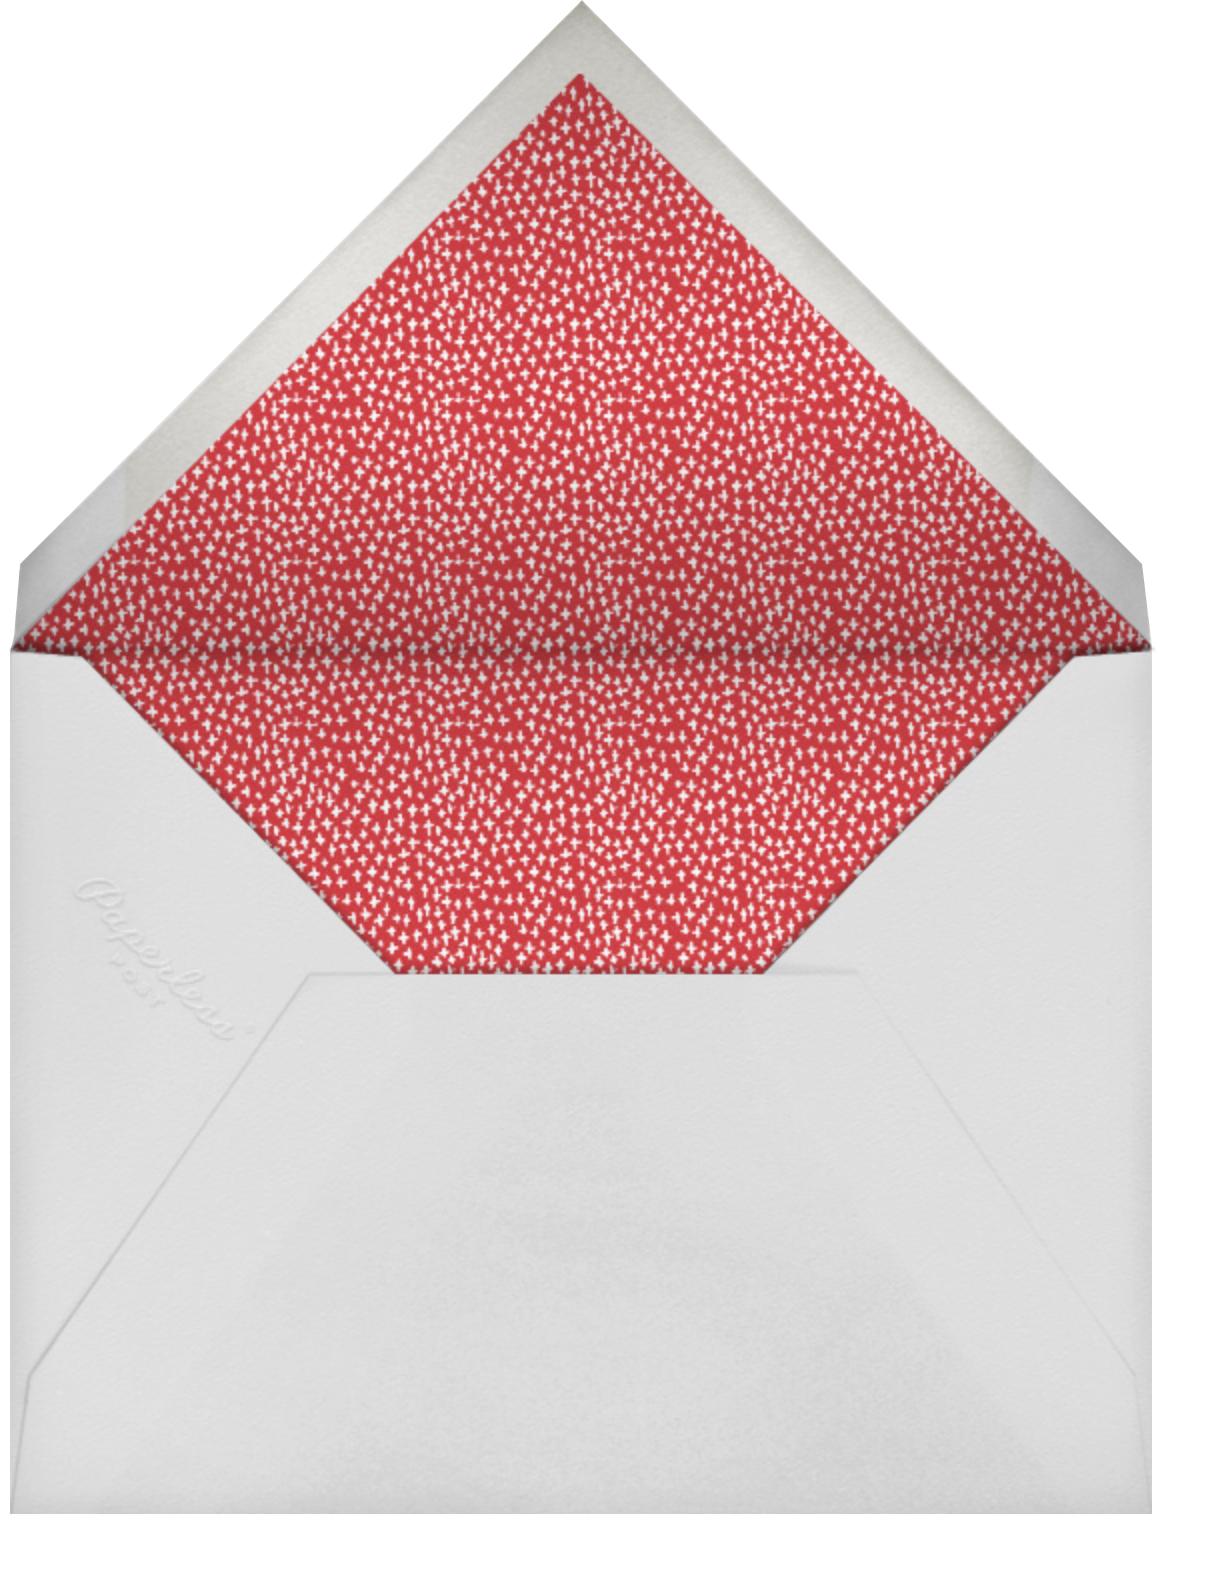 Holiday Pit Stop - Light - Mr. Boddington's Studio - Envelope